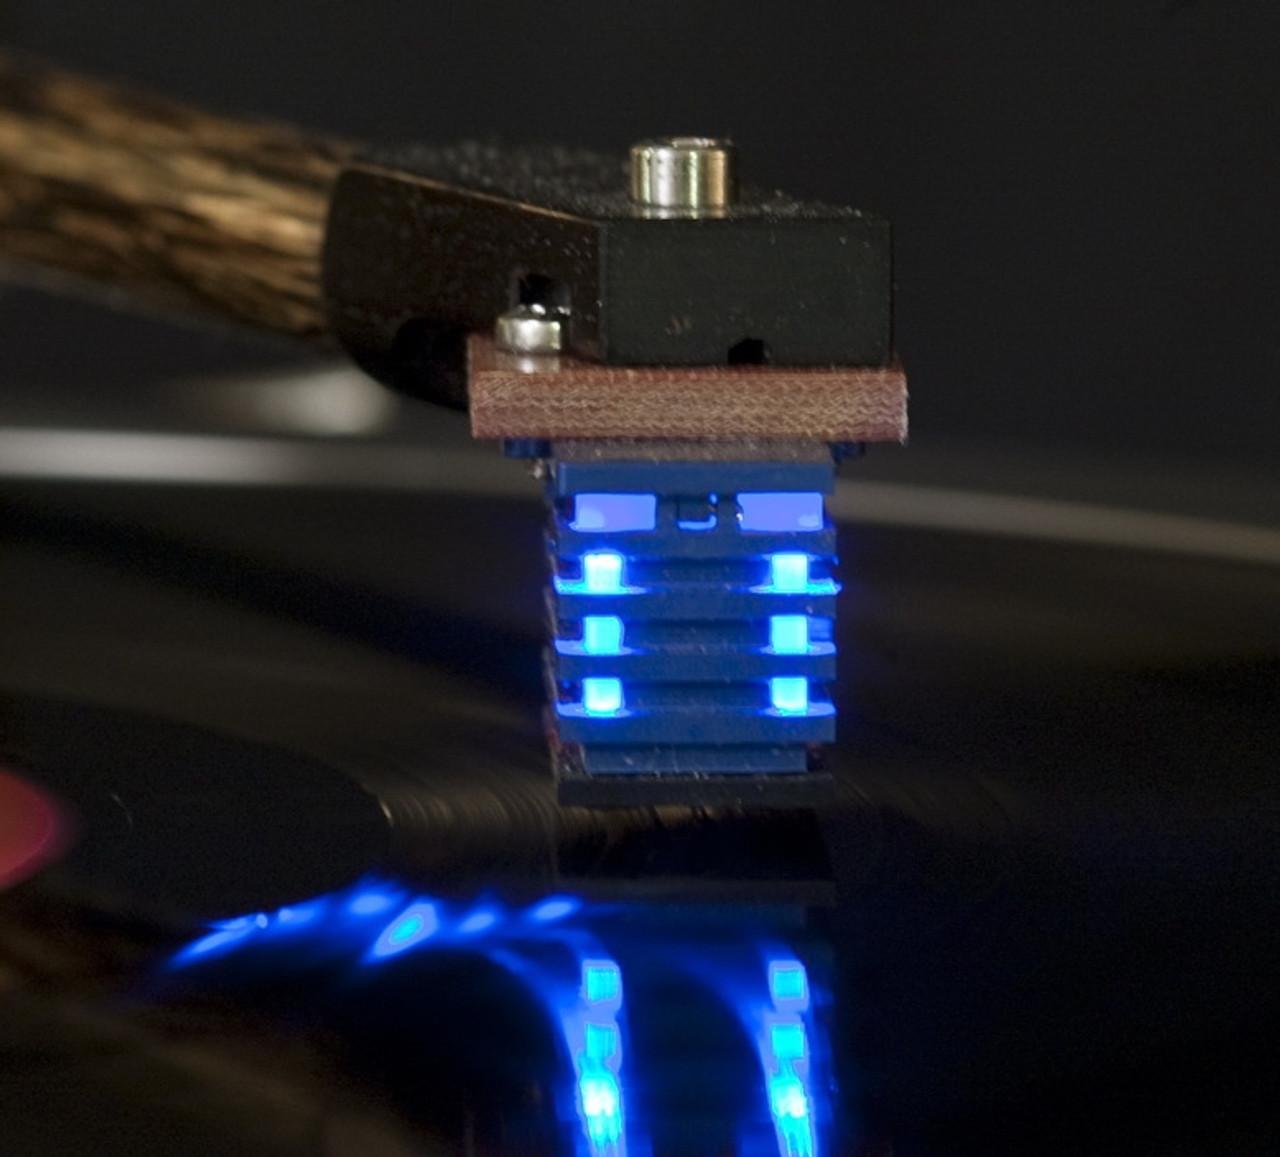 Soundsmith Strain Gauge SG-210 cartridge